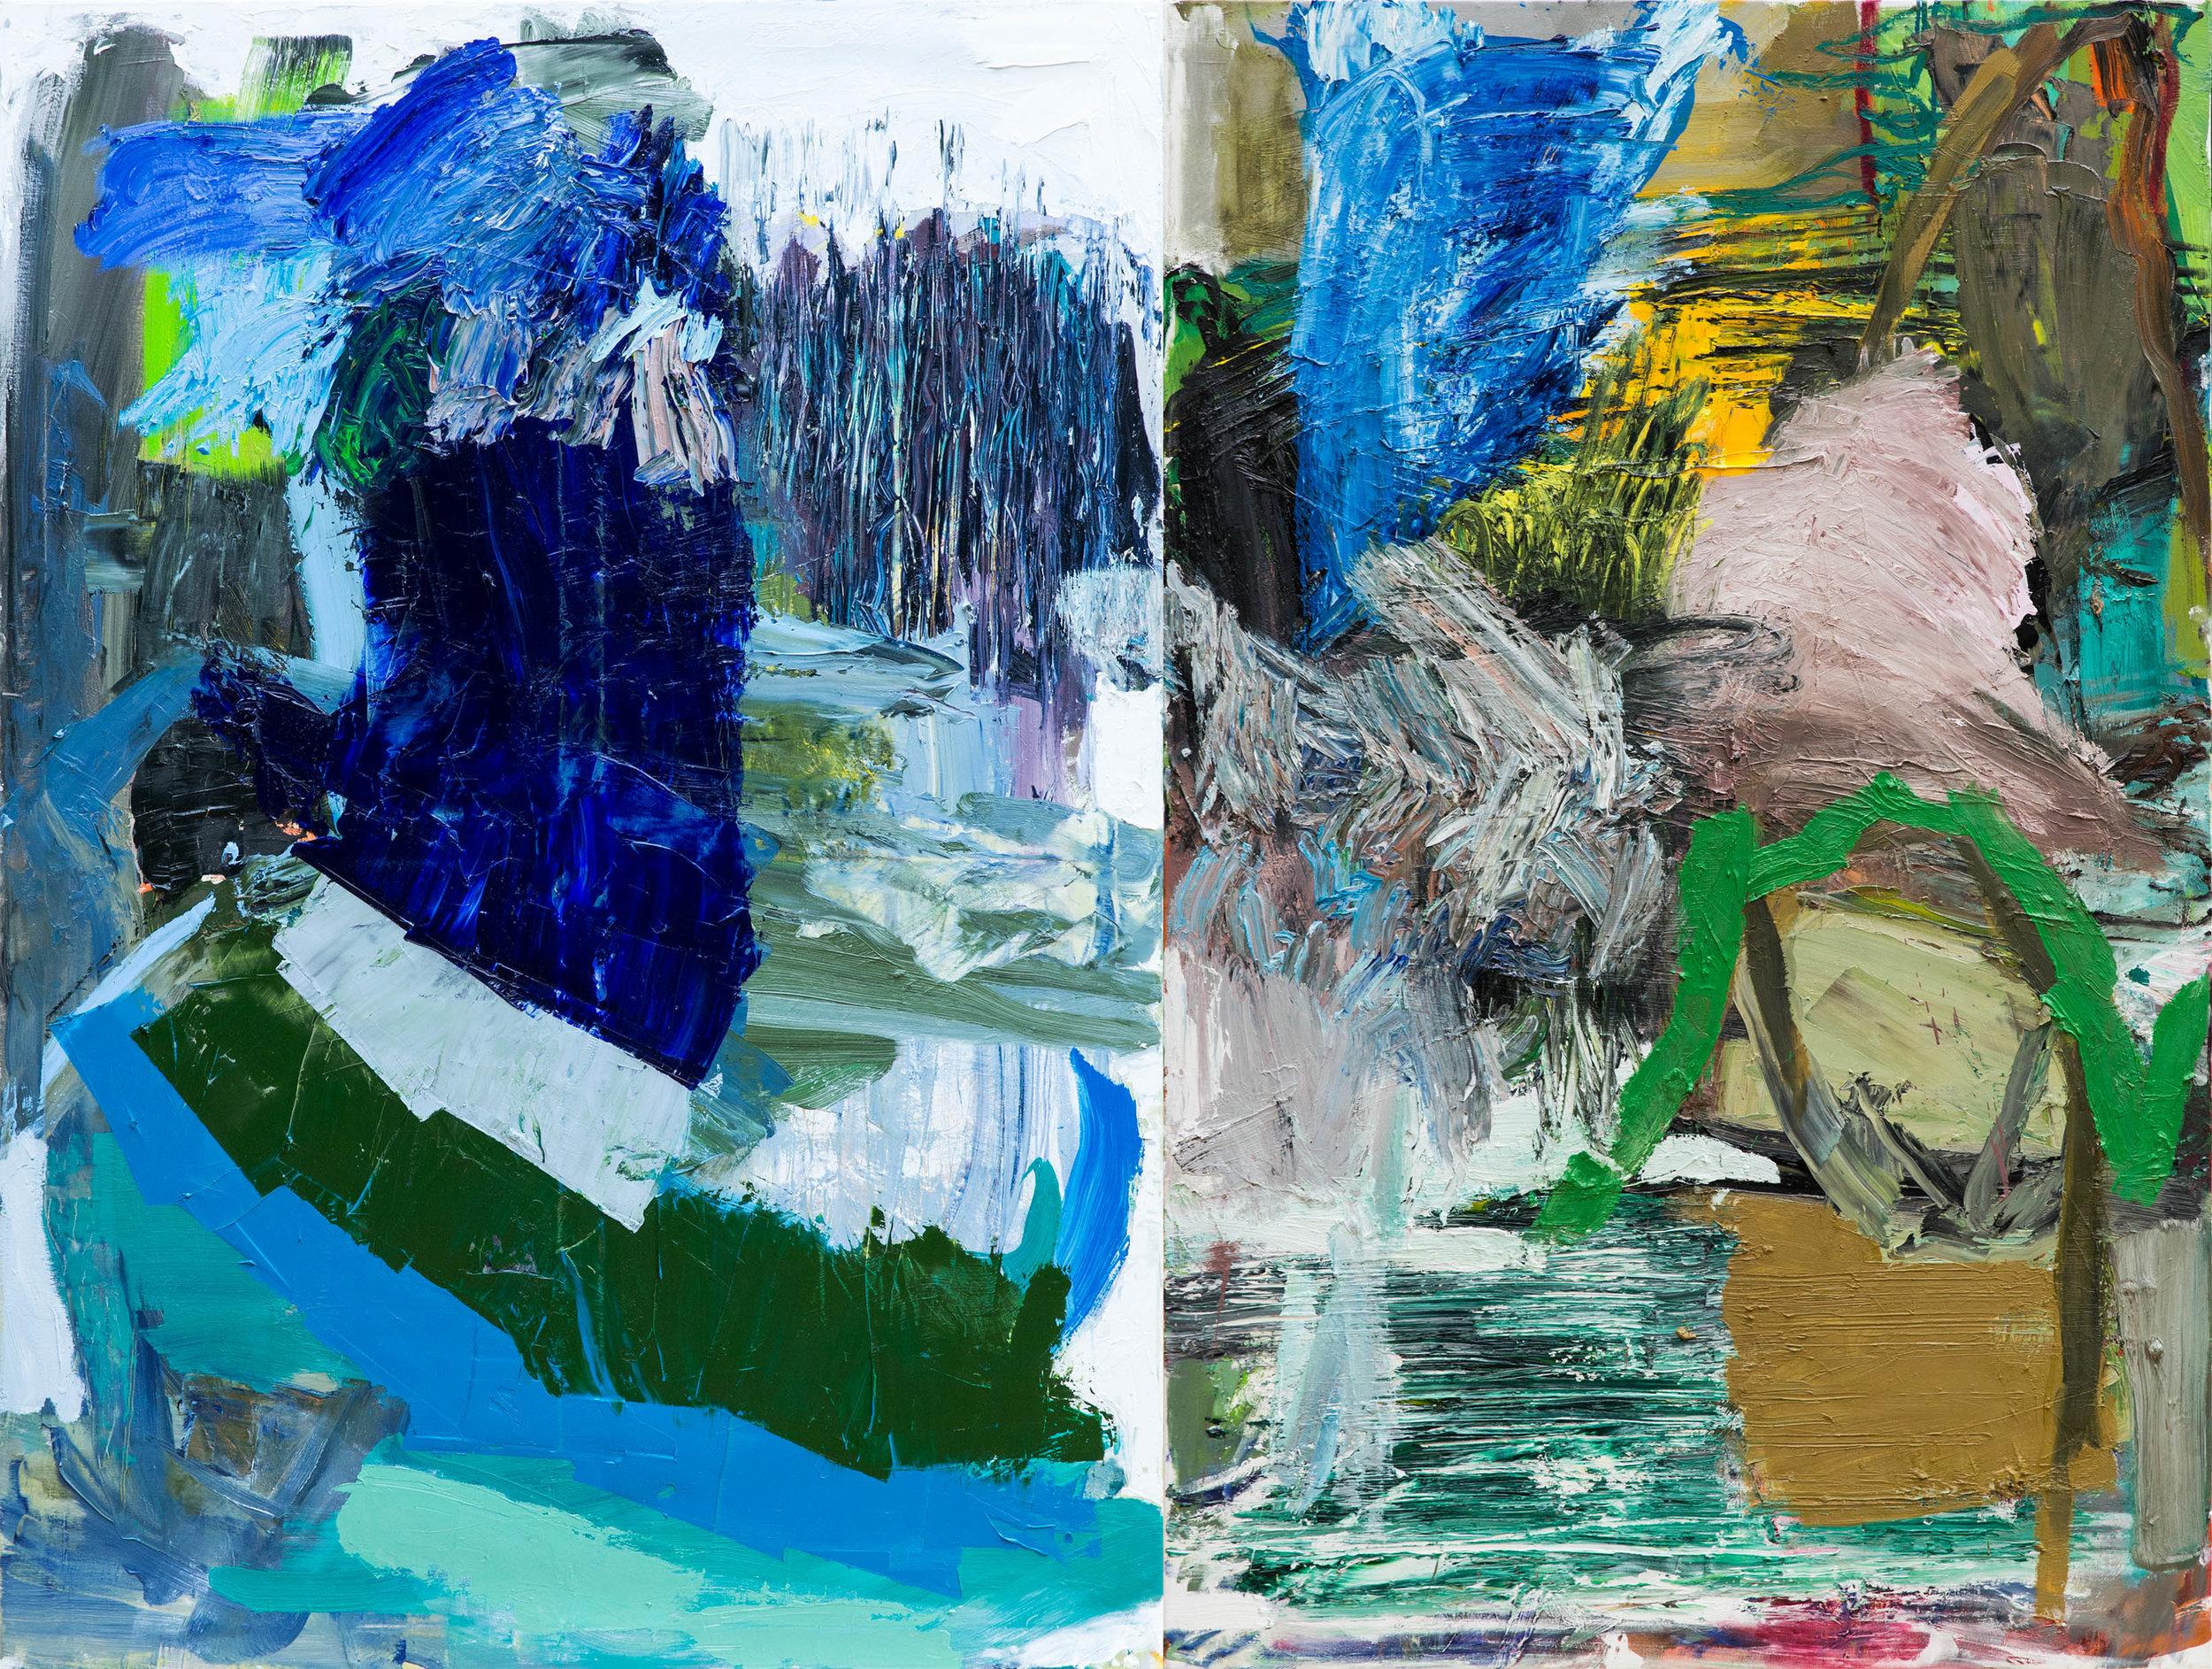 change of season  160 x 210 cm (Diptychon)  oil on canvas